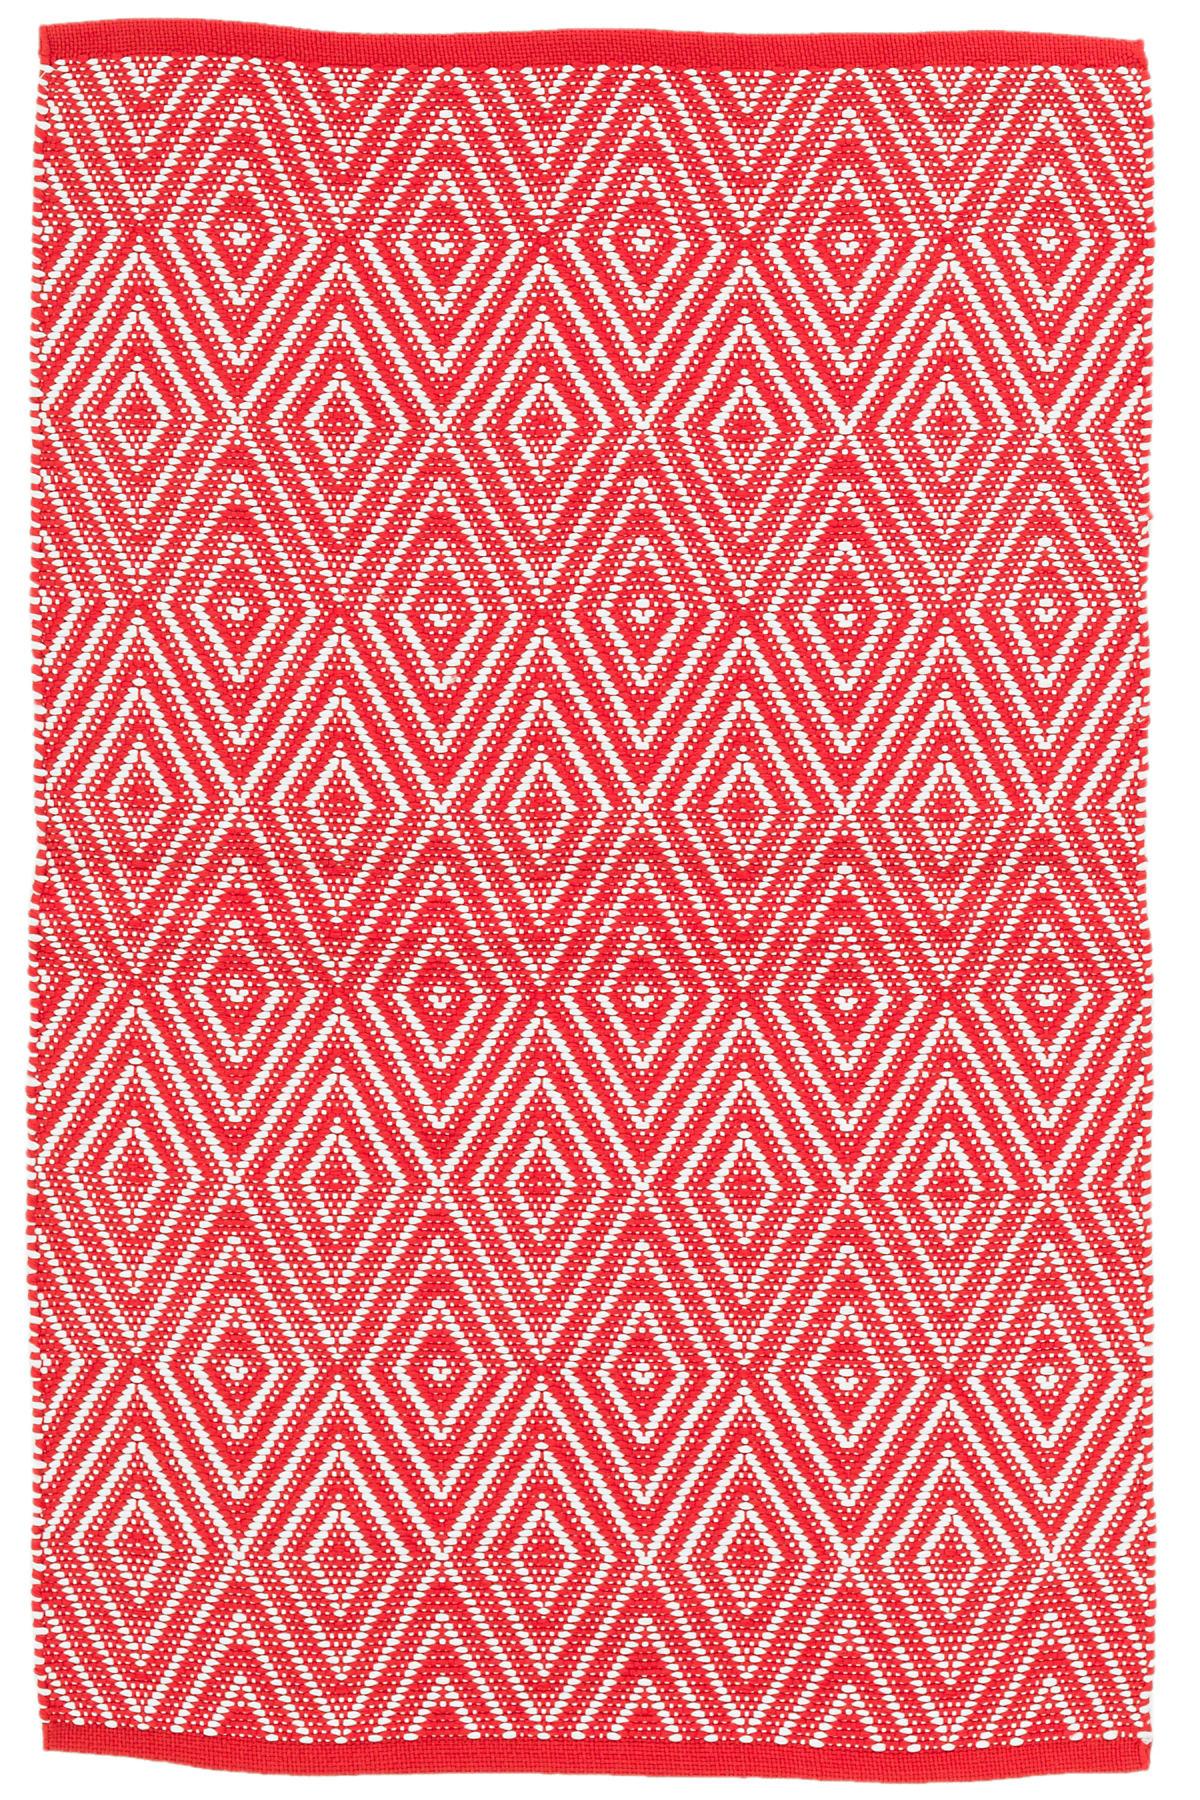 Diamond Red/White Indoor/Outdoor Rug